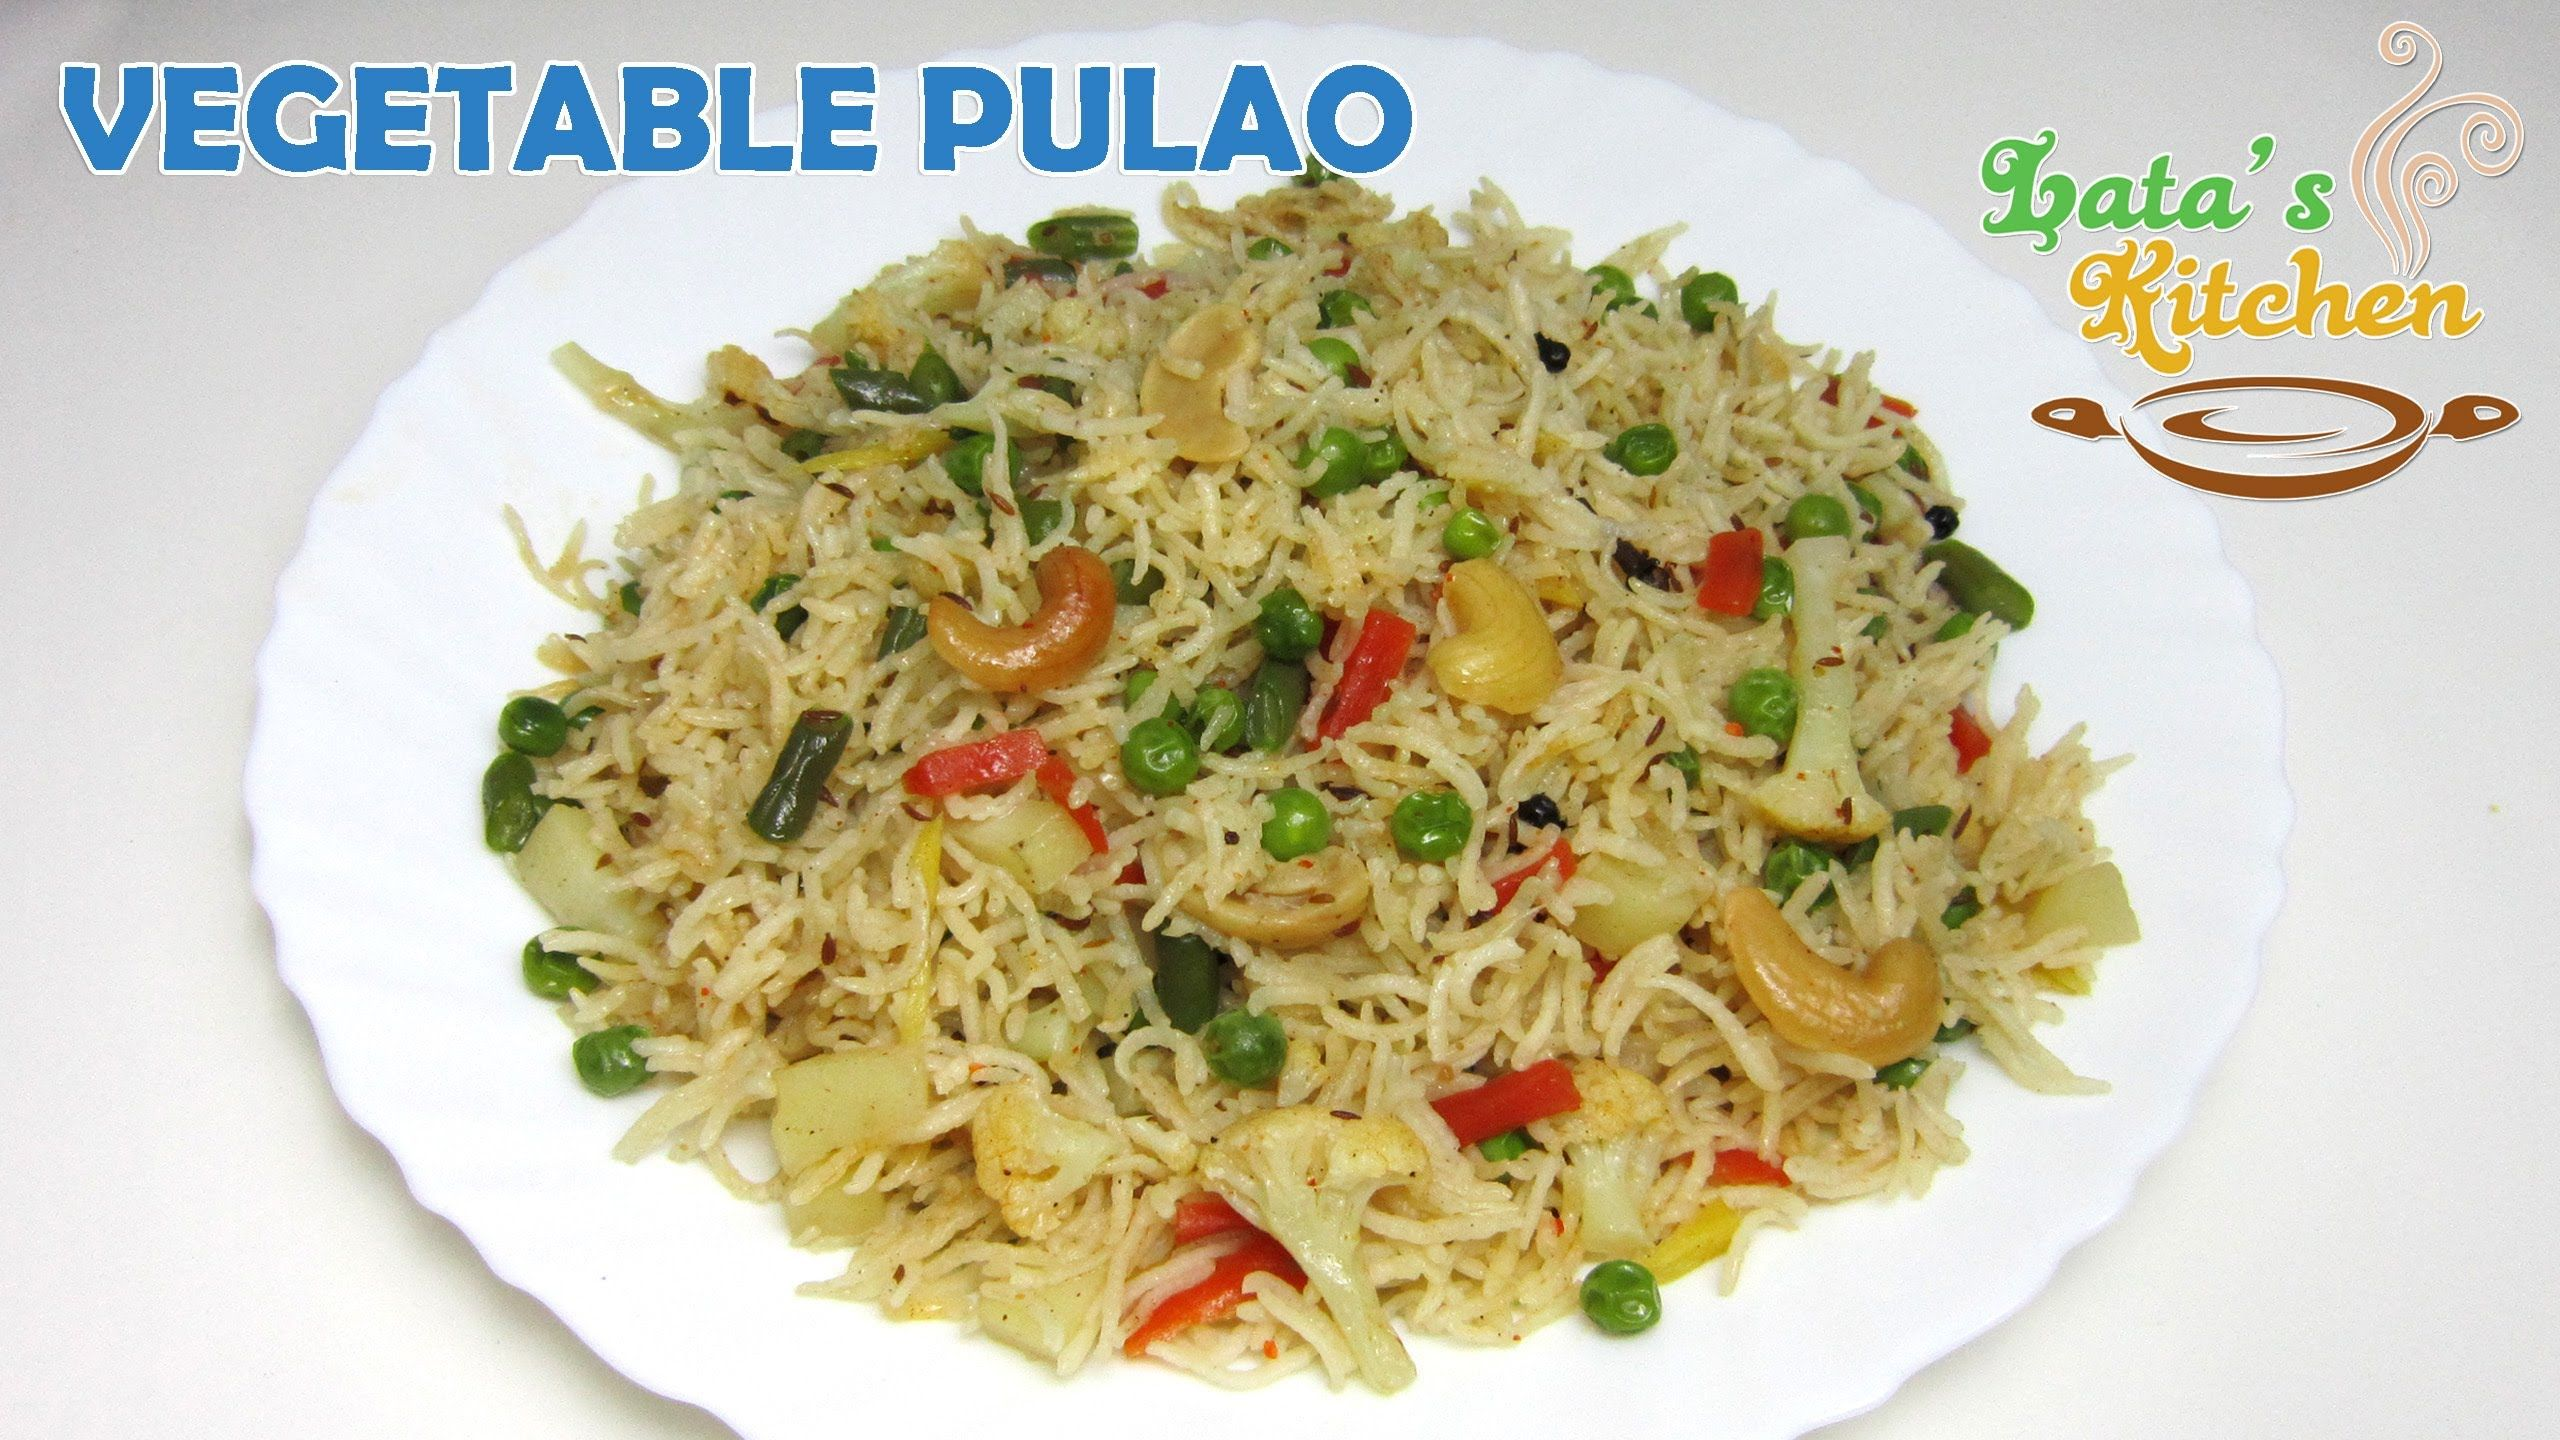 Vegetable pulao recipe video veggie pulav rice indian vegetable pulao recipe video veggie pulav rice indian vegetarian recipe by forumfinder Images